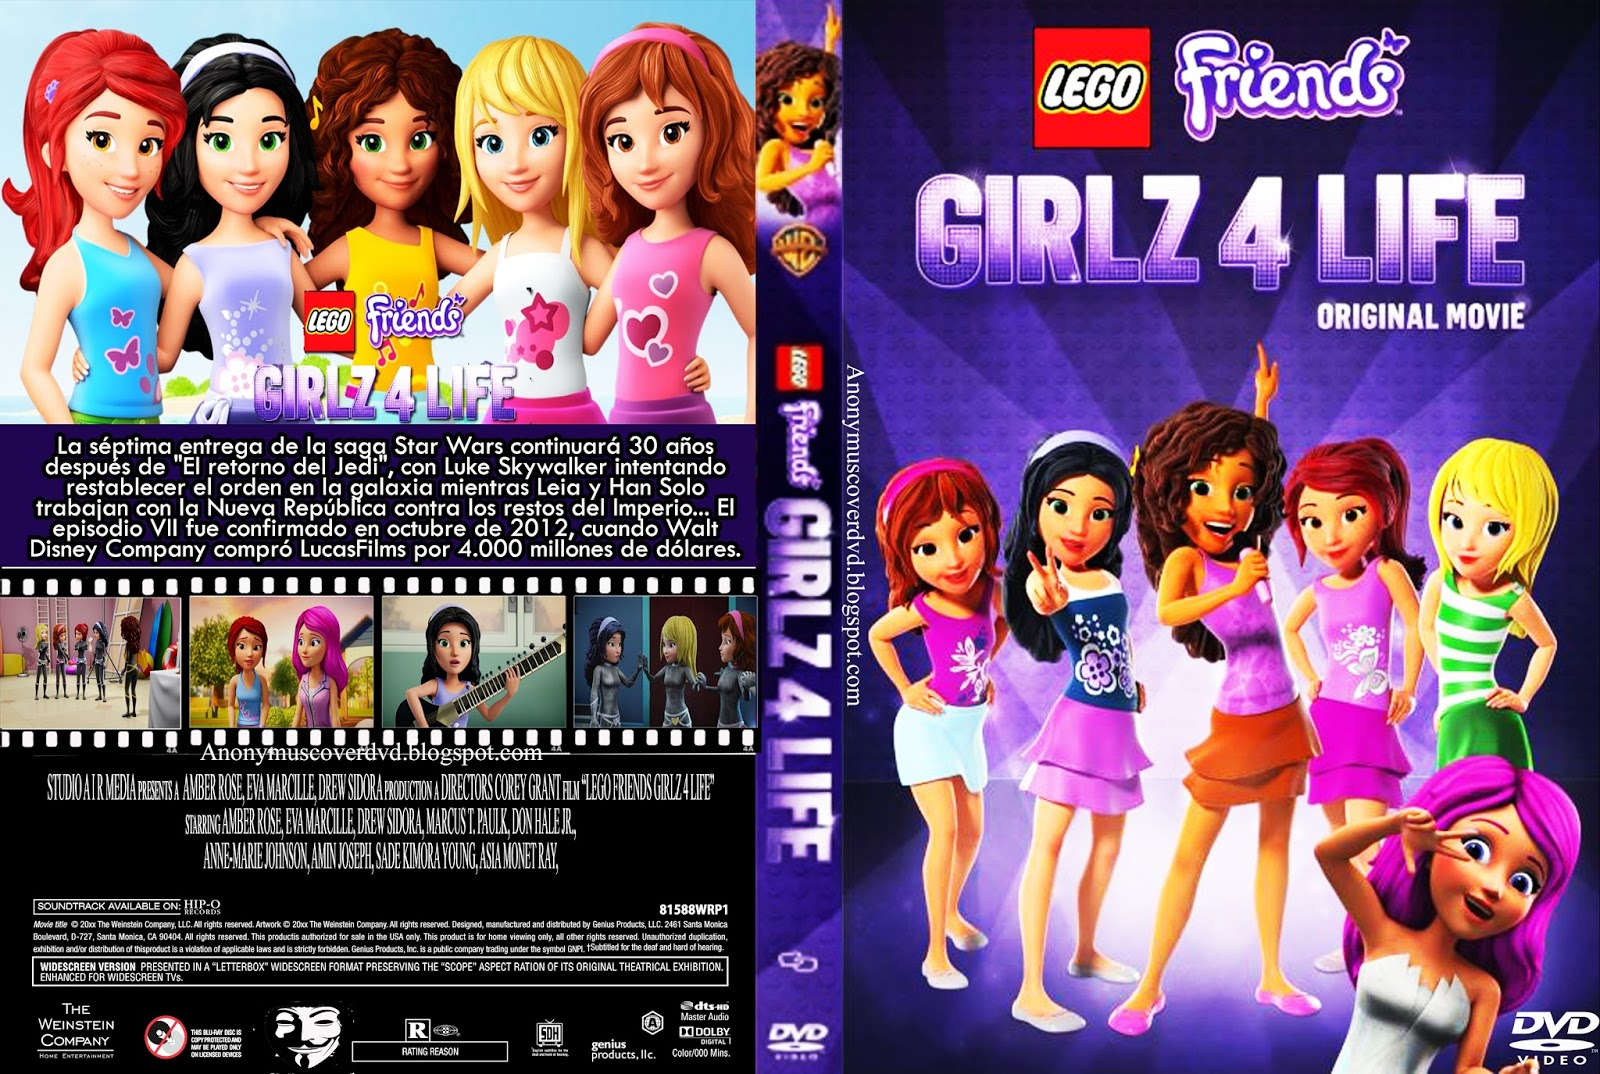 LEGO Friends Girlz 4 Life BRRip 720p X264 Dual Áudio lego 2Bfriends 2Bgirlz 2B4 2Blife 2B  2Banonymuscoverdvd